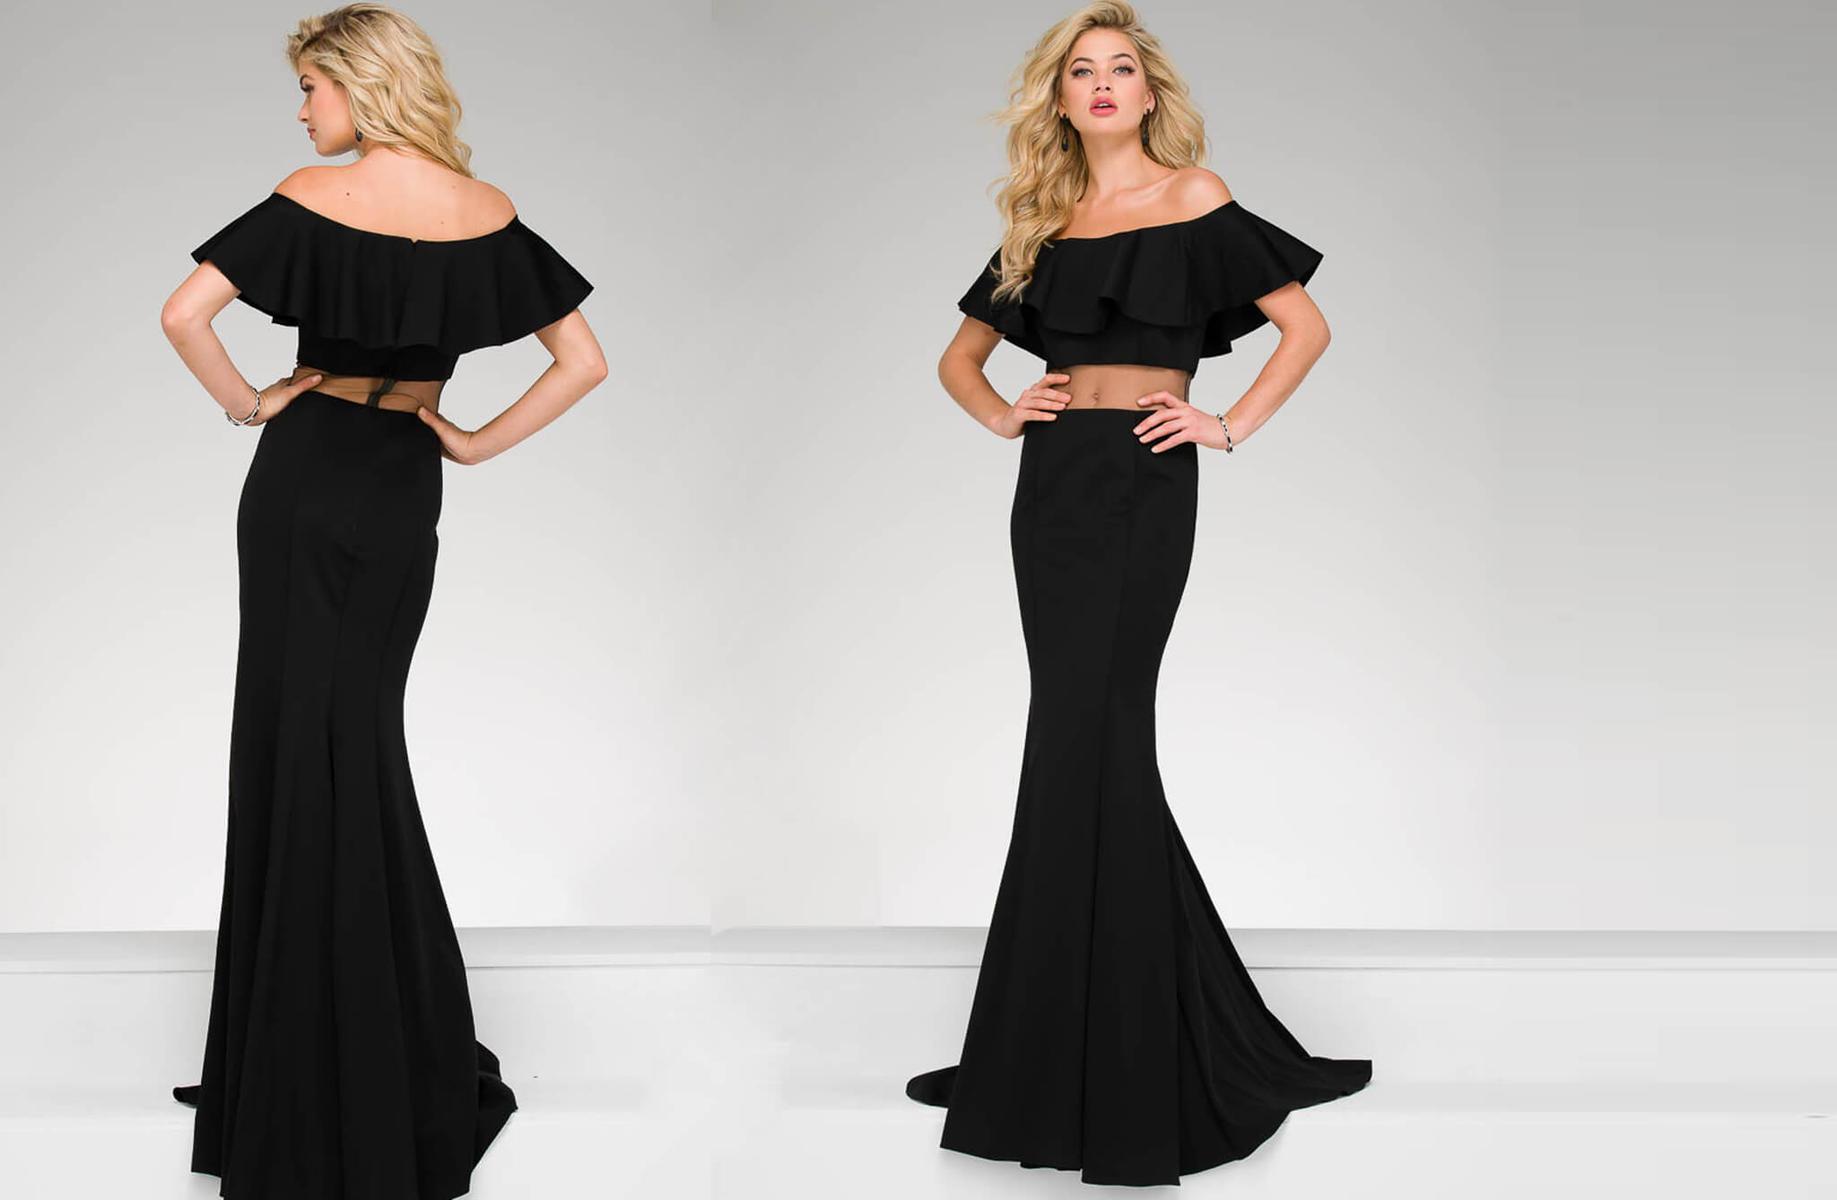 Jovani 2-piece illusion dress